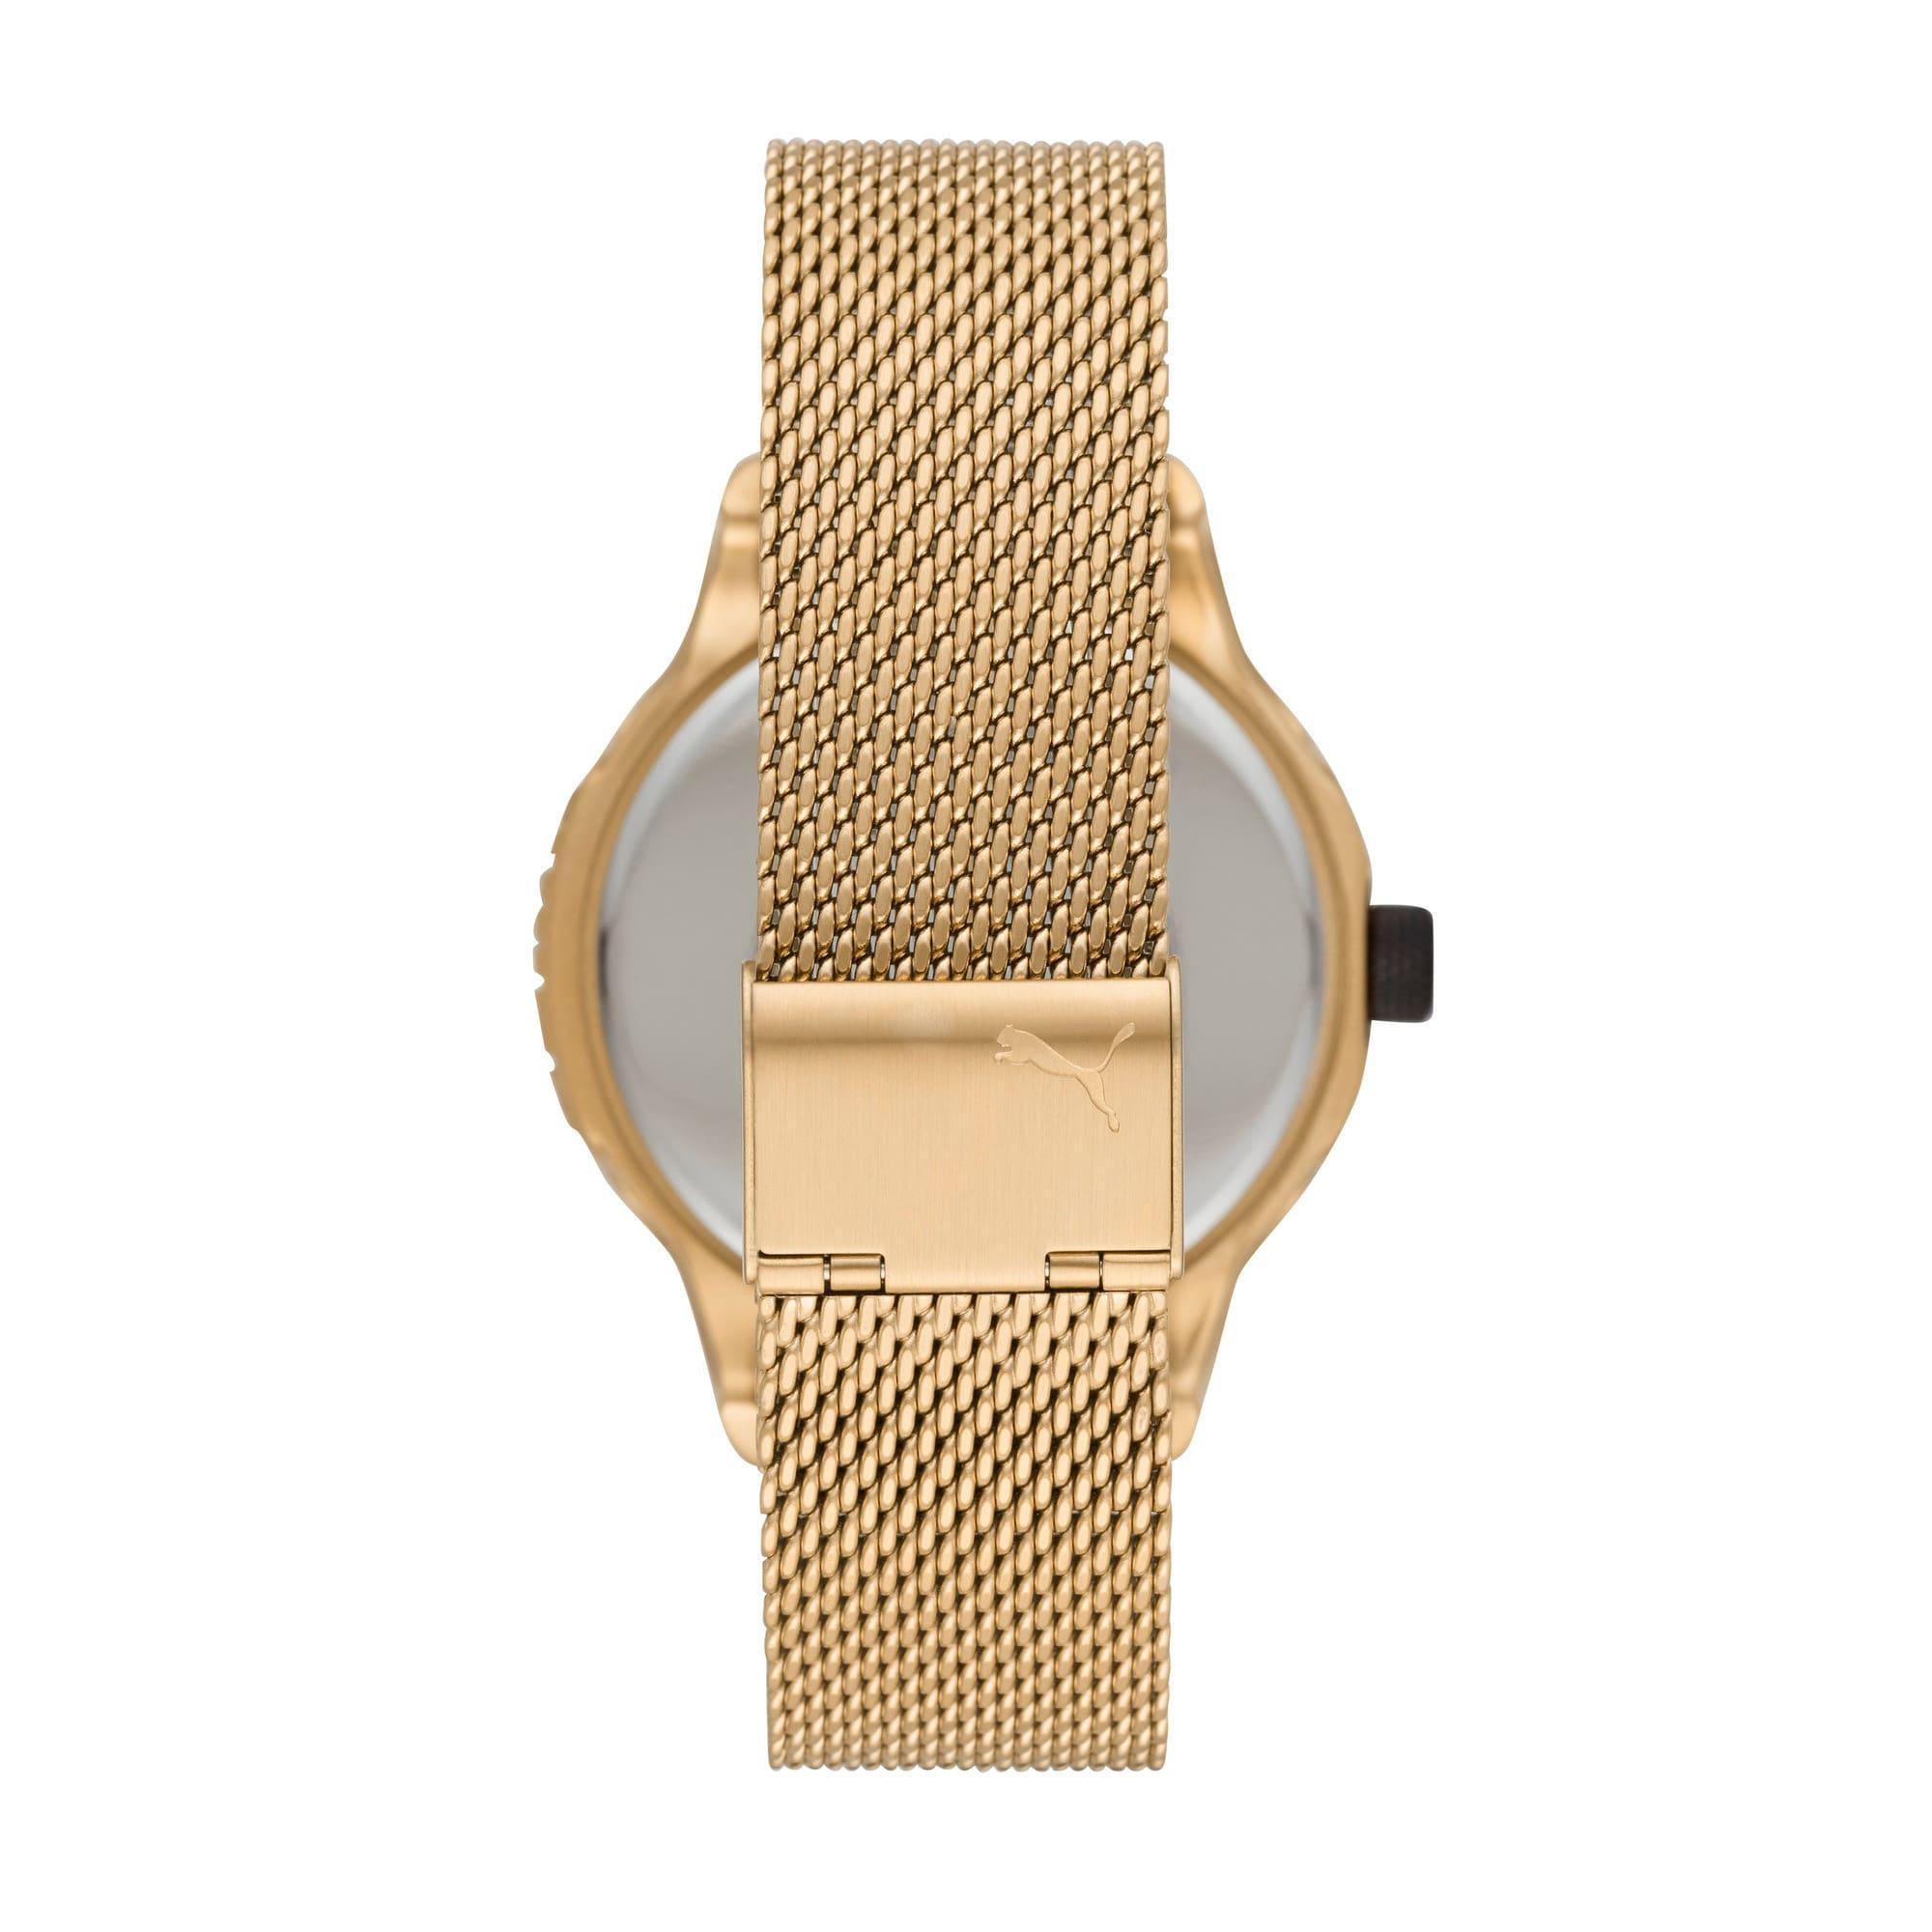 Thumbnail 3 of Reset v1 Watch, Gold/Gold, medium